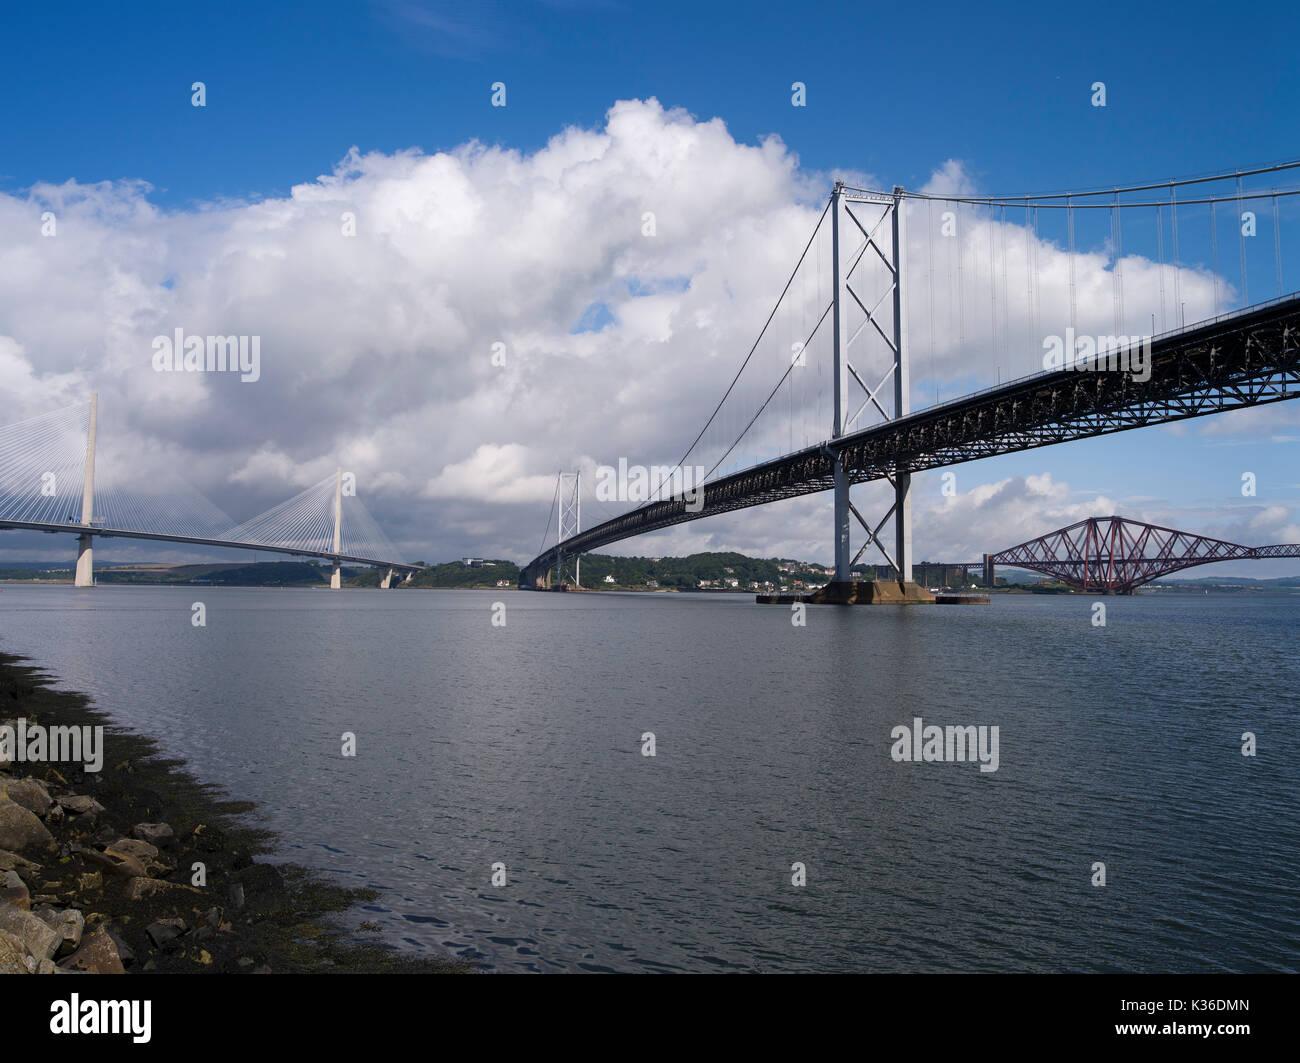 dh Queensferry Crossing FORTH BRIDGE FIRTH OF FORTH Three River Forth Bridges Scotland roadbridge - Stock Image